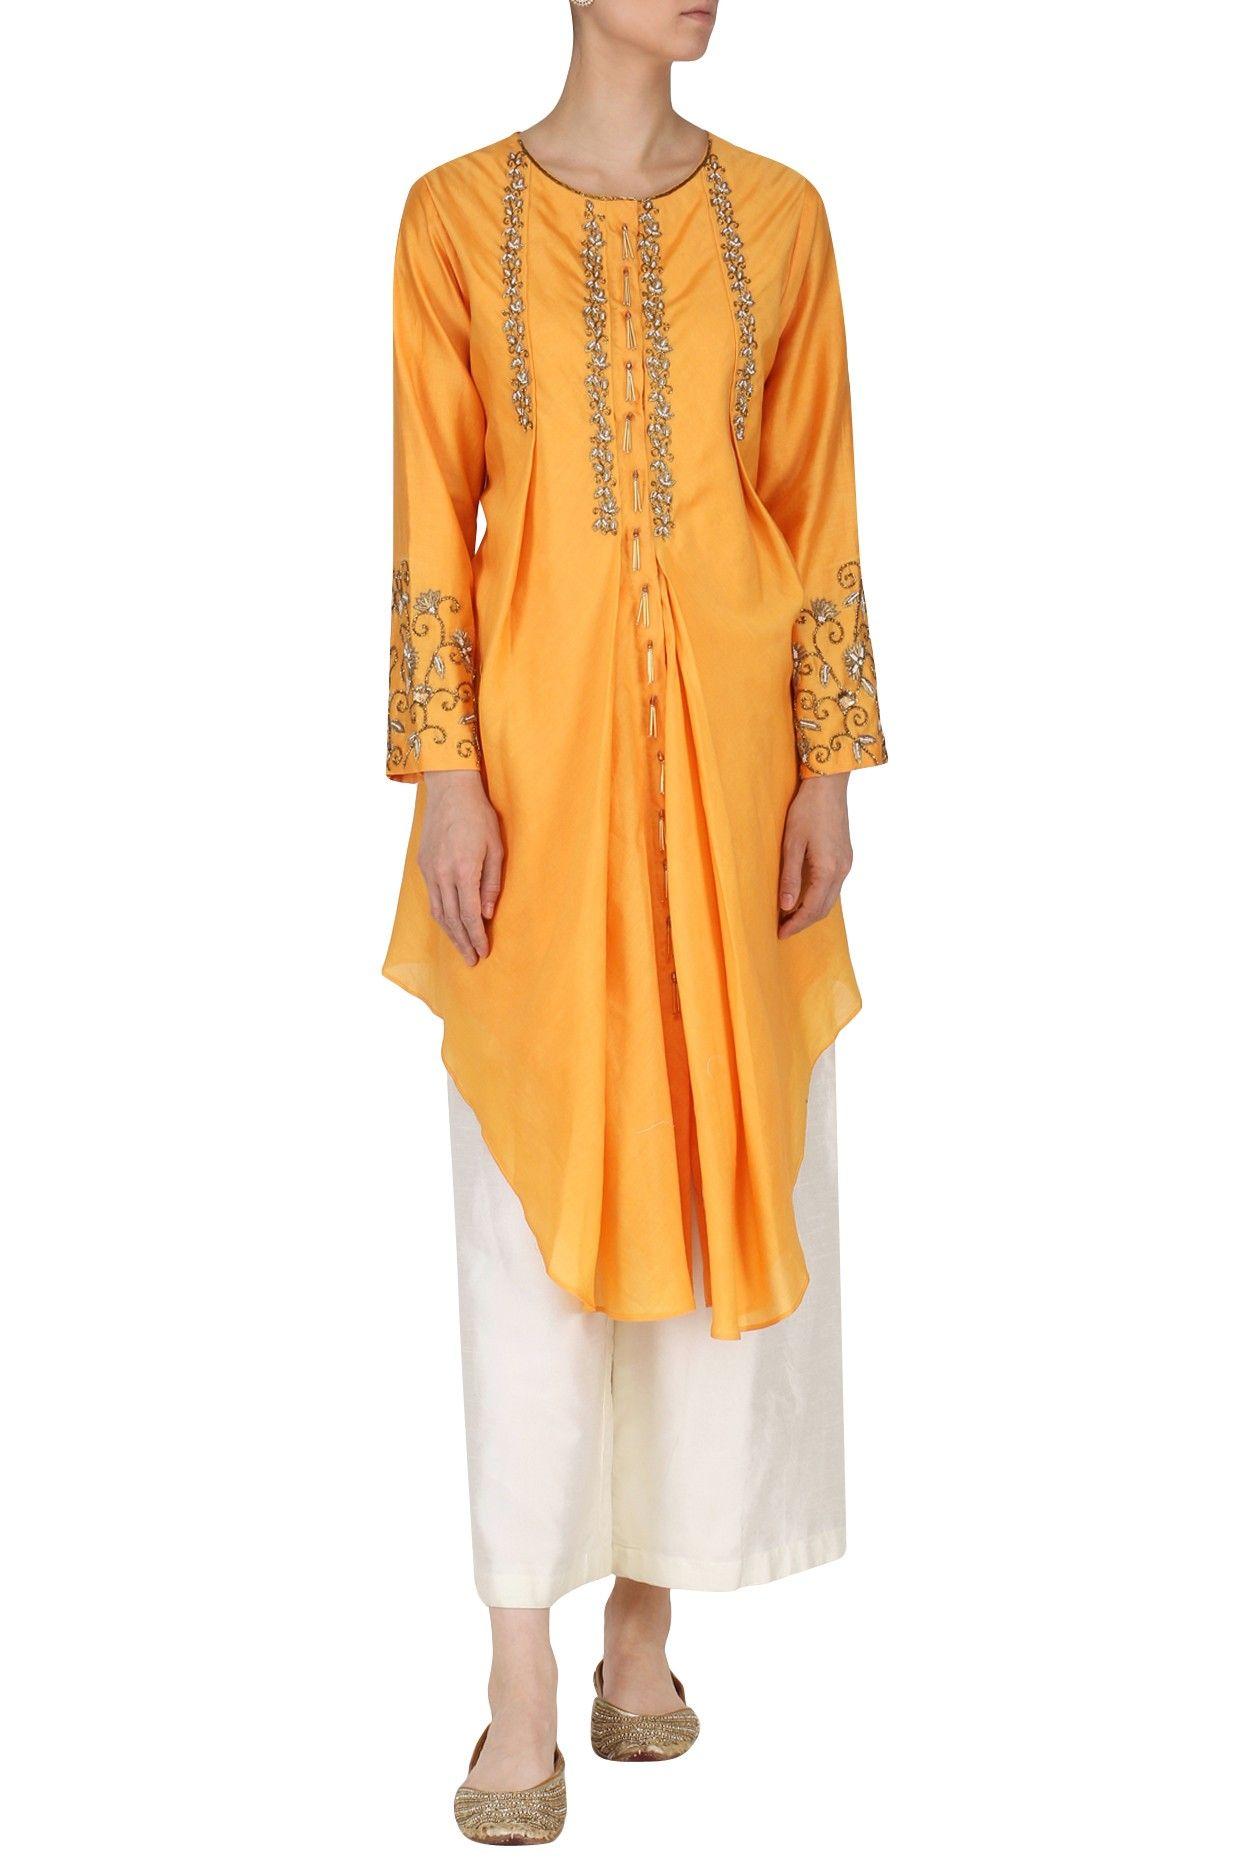 KAZMI INDIA Burnt Orange Embroidered Tunic with Palazzo Pants. Shop now!   kazmiindia  burntorange  embroidery  tunic  palazzo  ethnic  fashion ...